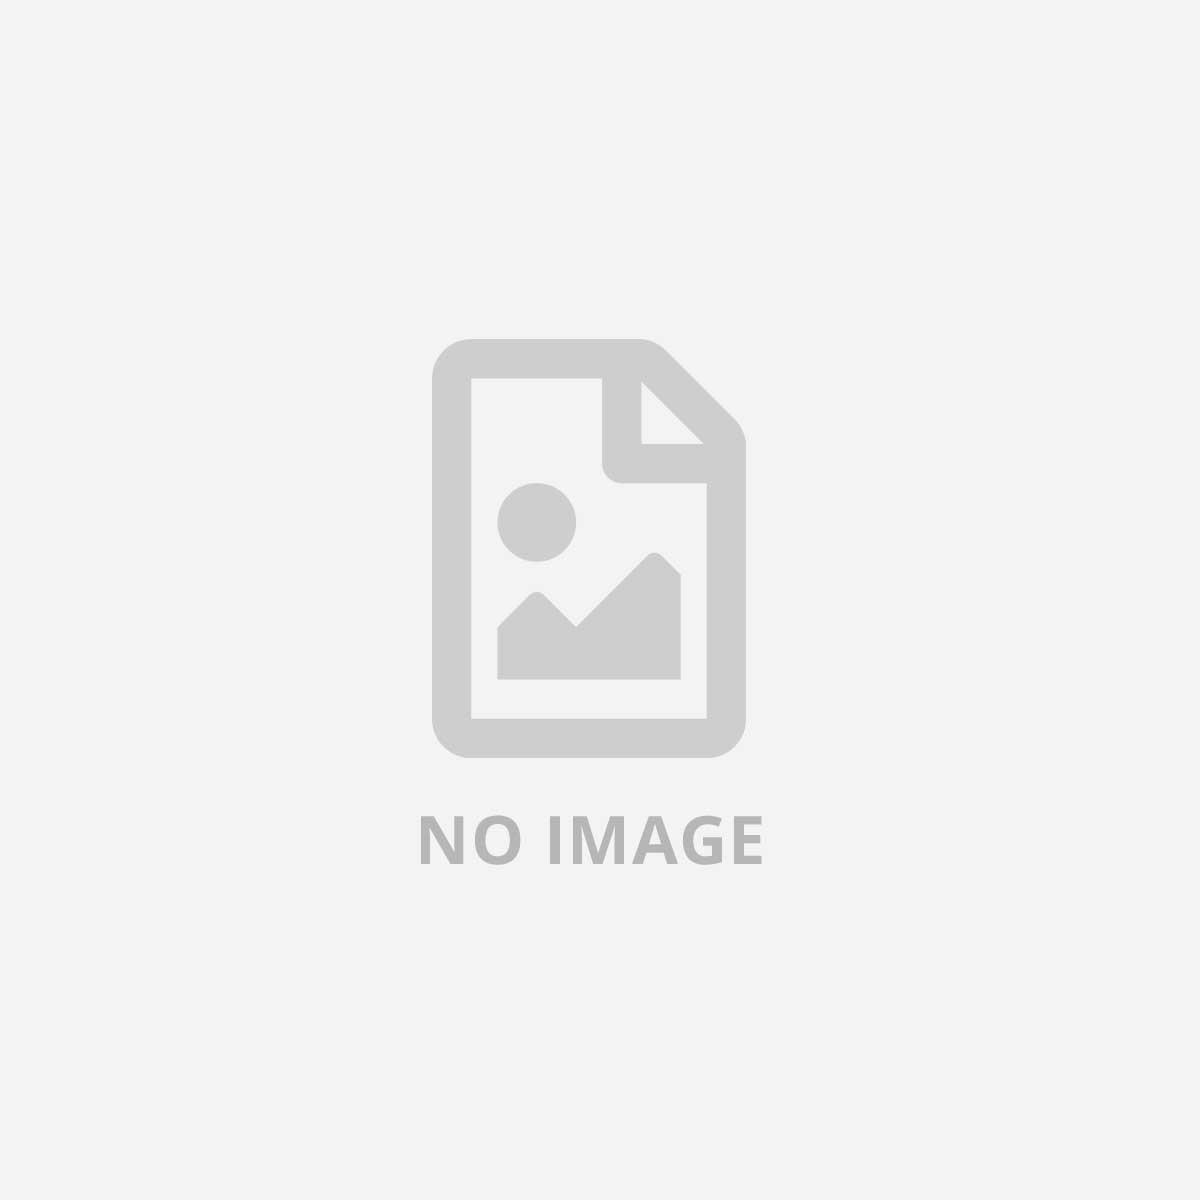 FUJIFILM LTO ULTRIUM G4 800-1600GB